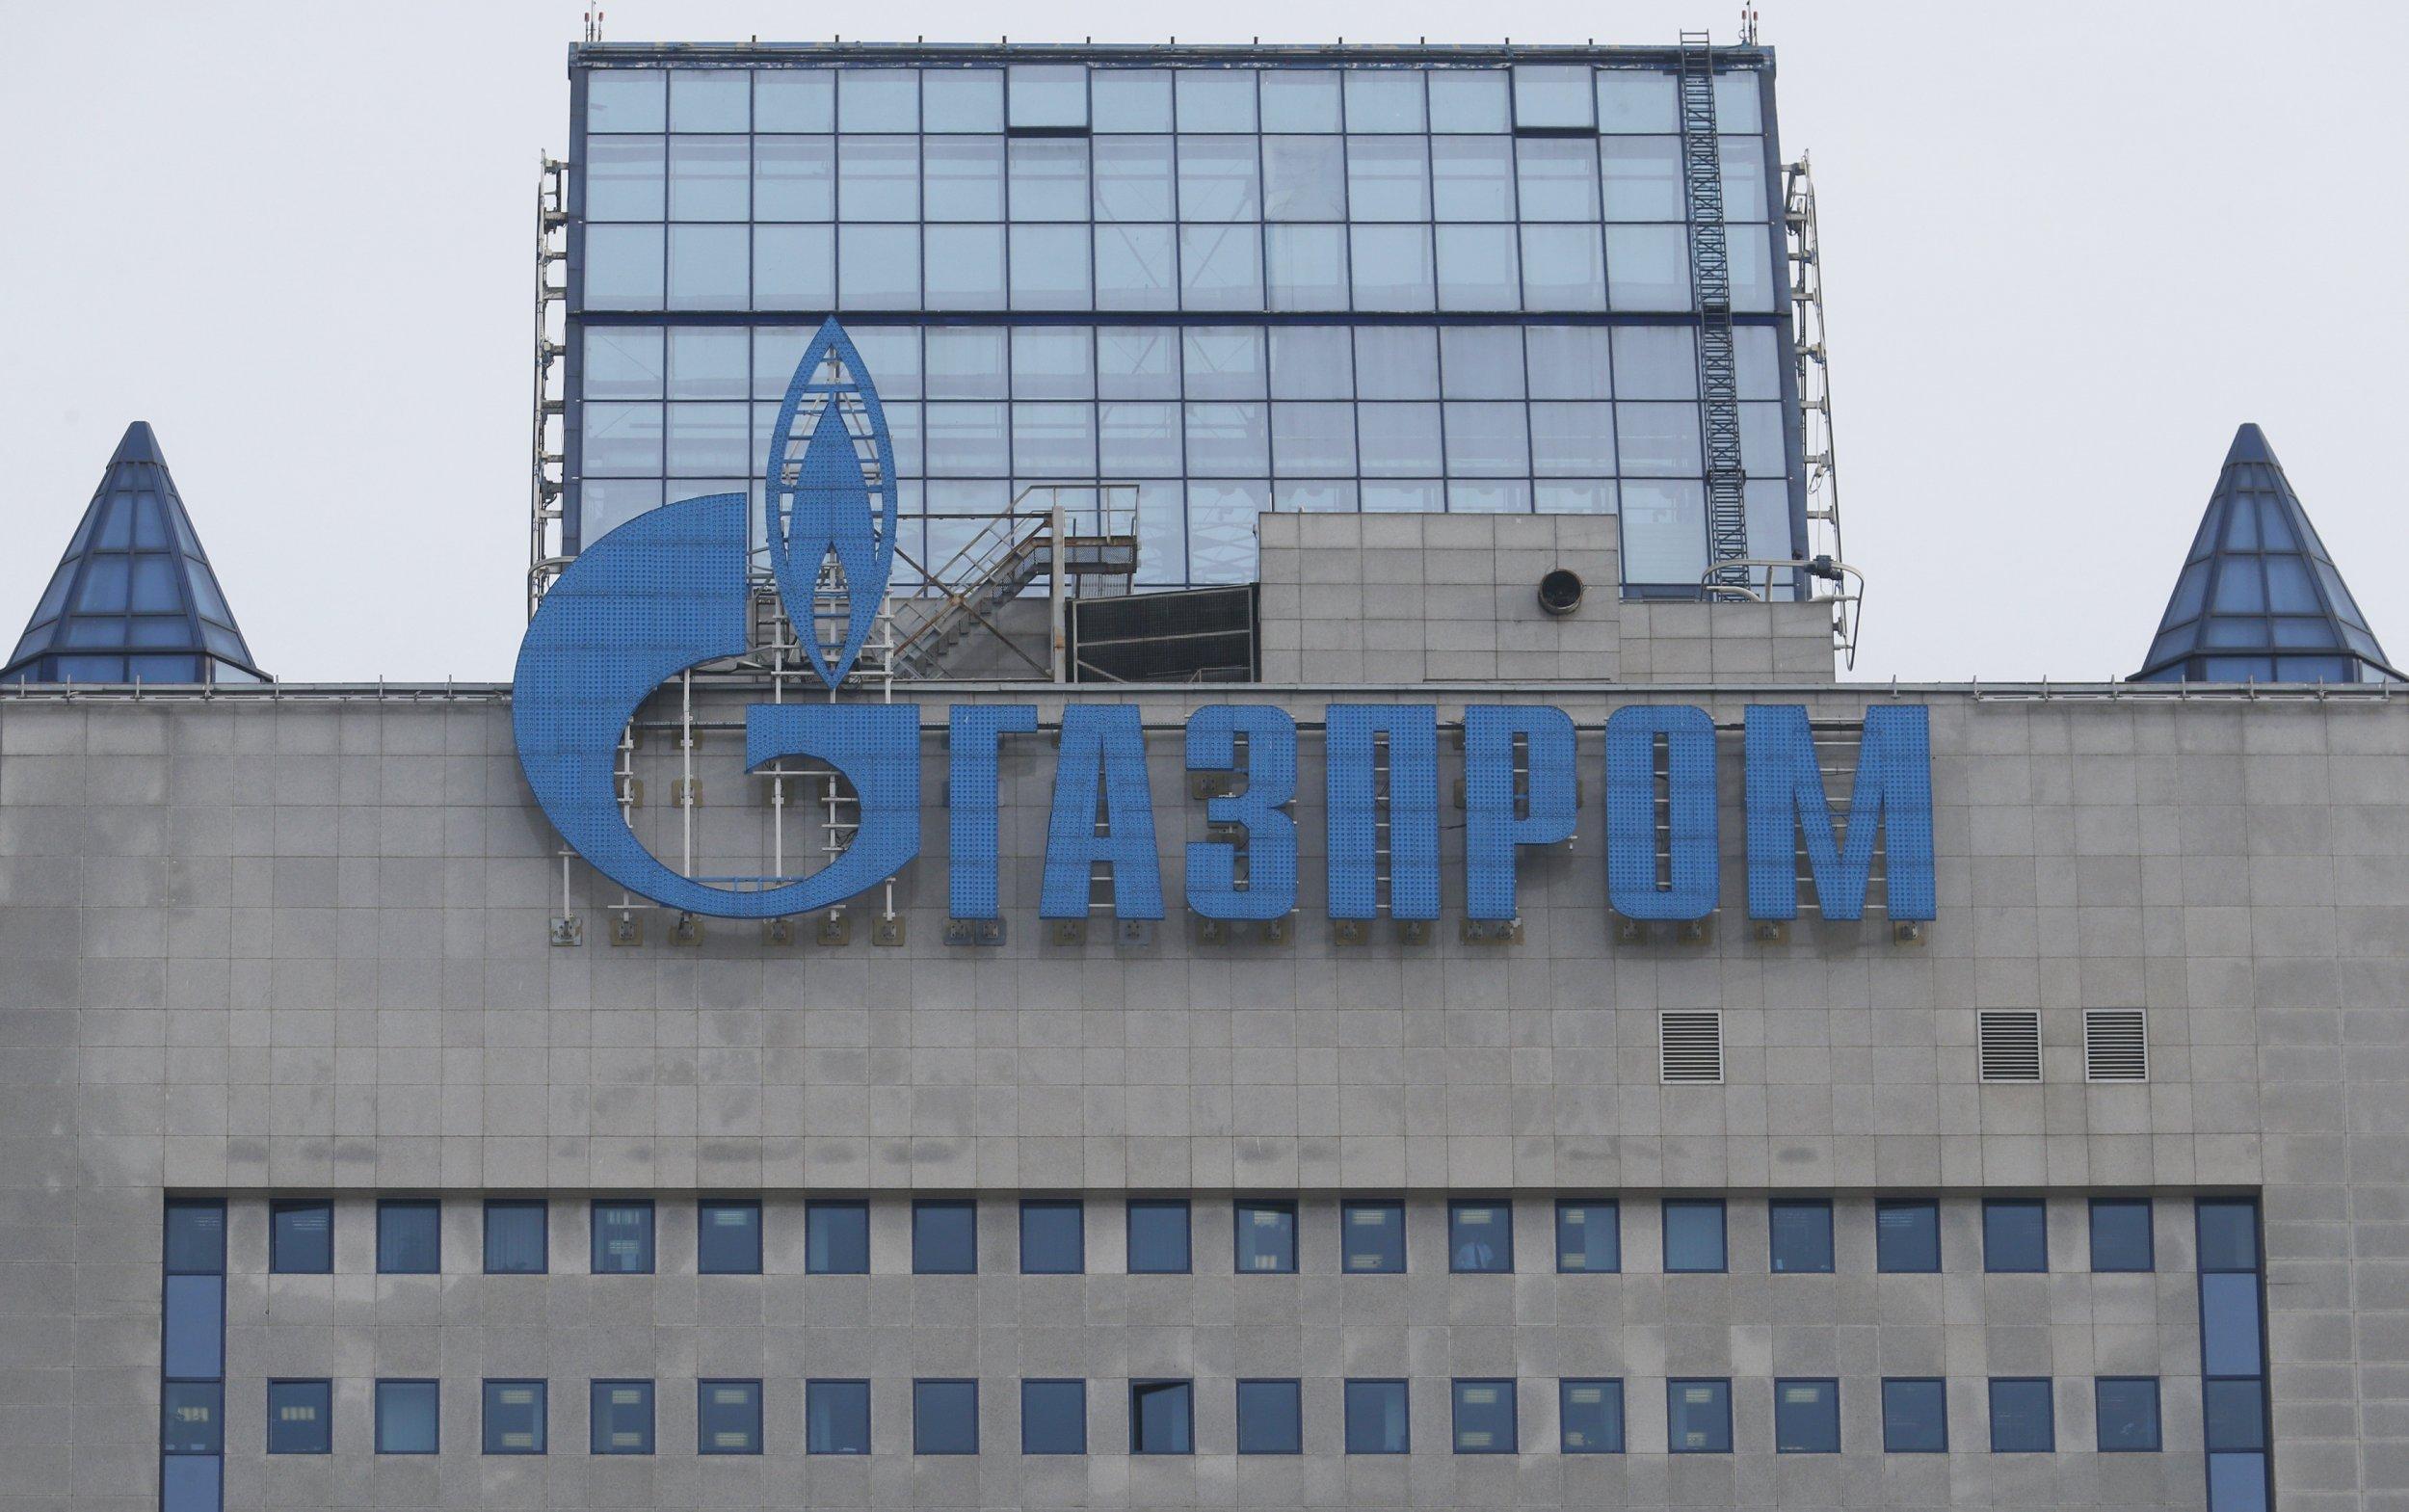 09_08_Gazprom_01